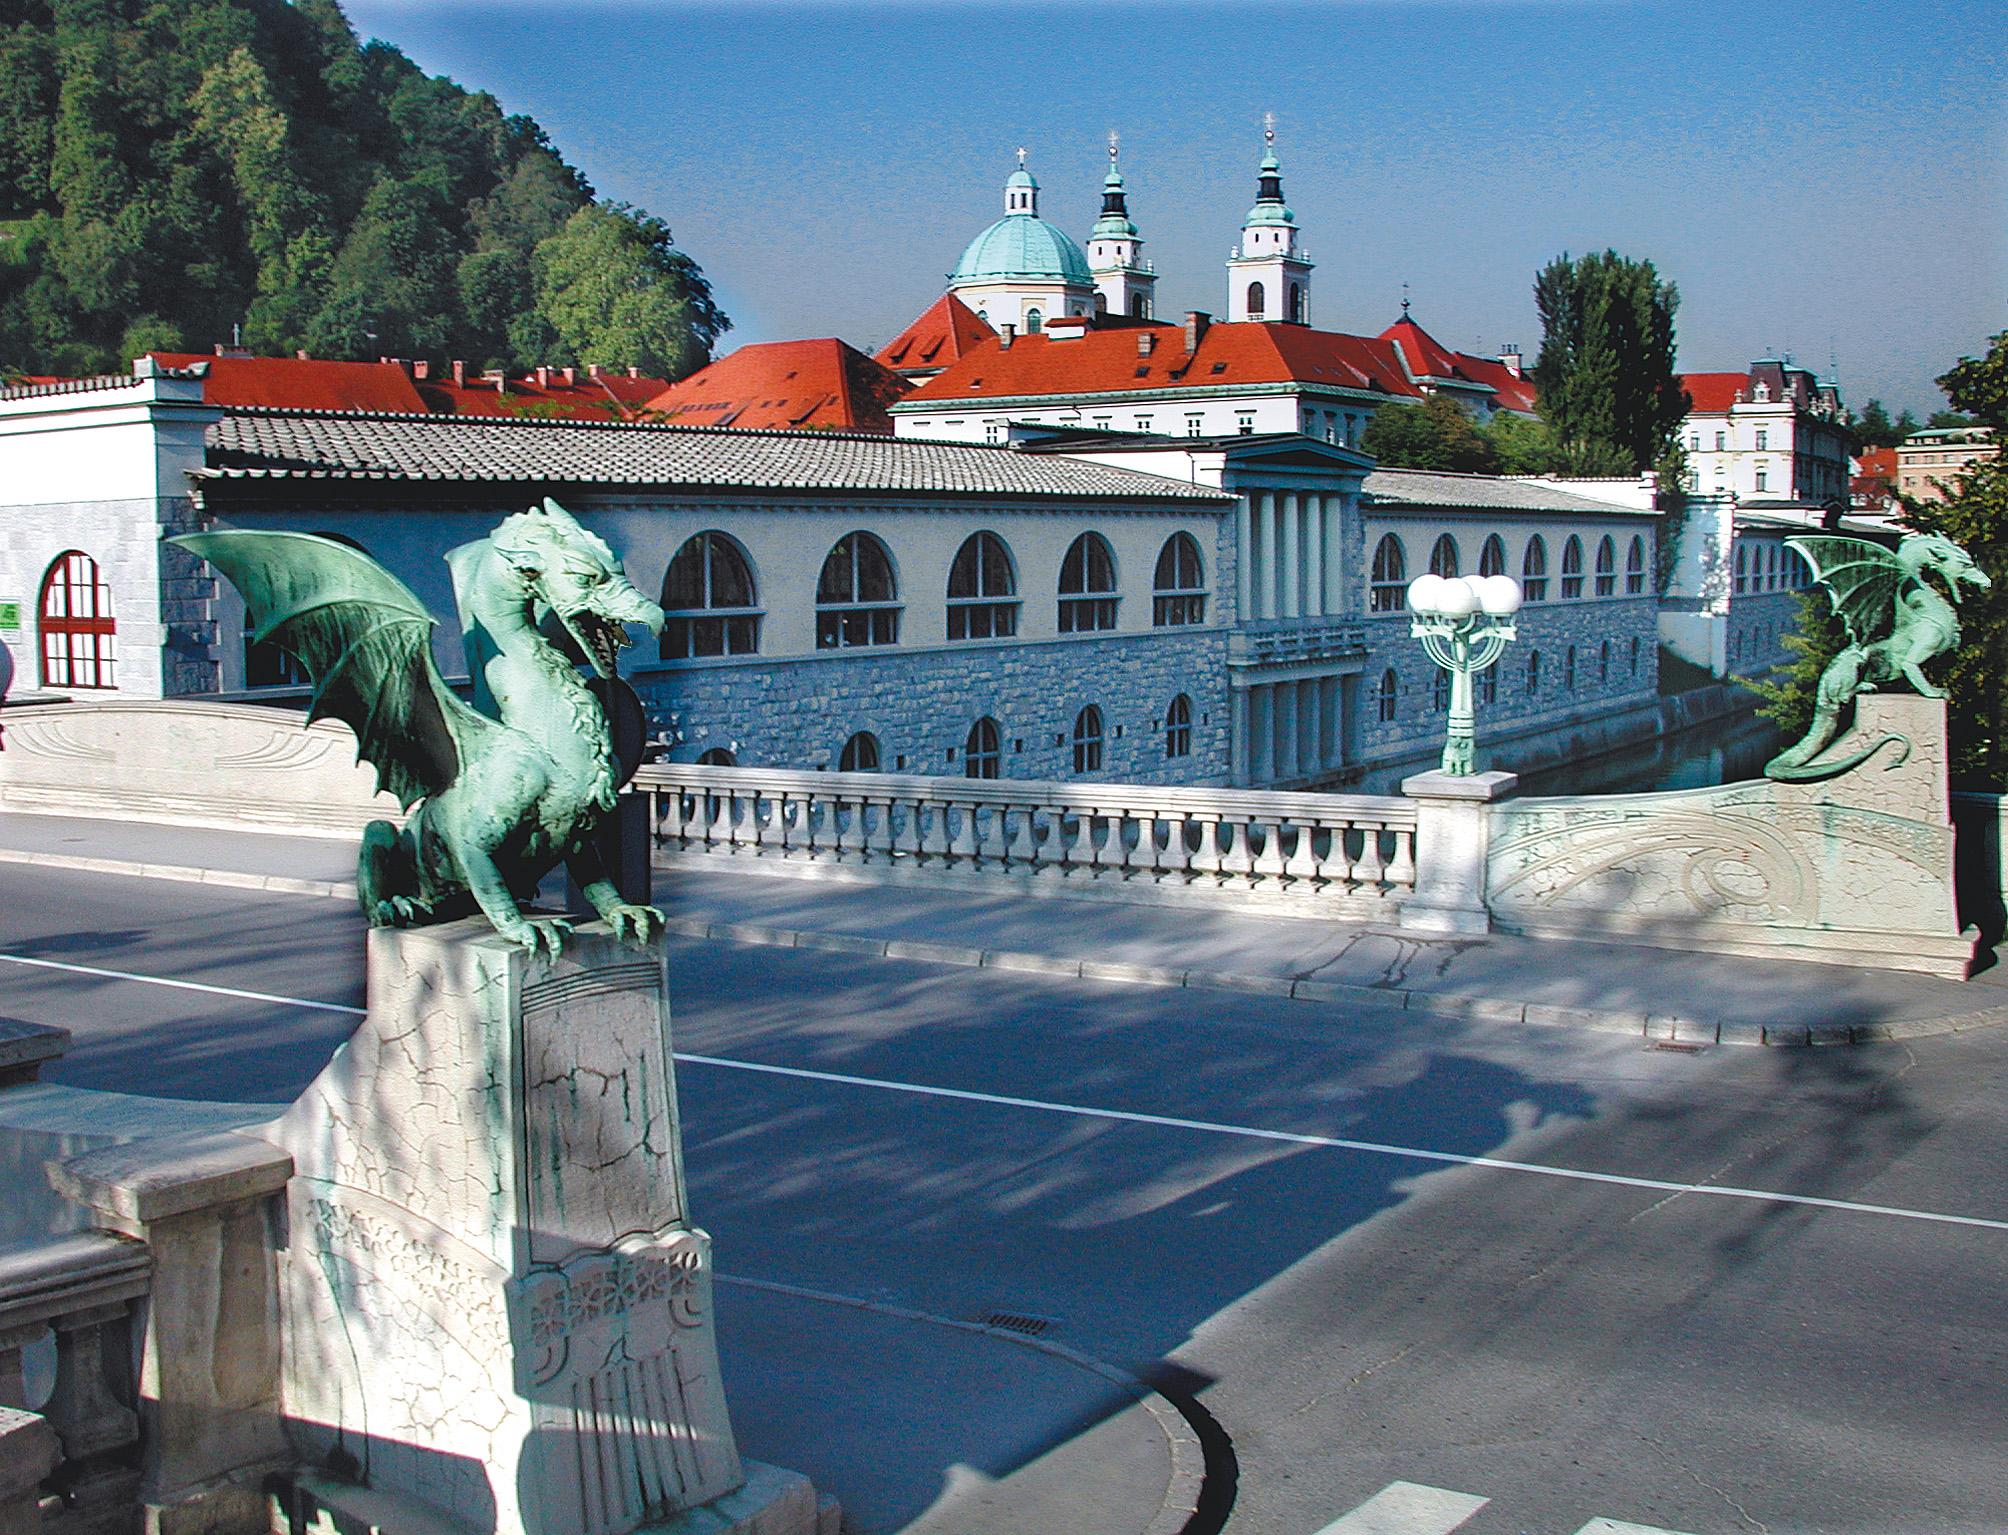 Victory at the Berlin travel trade show » City of Ljubljana